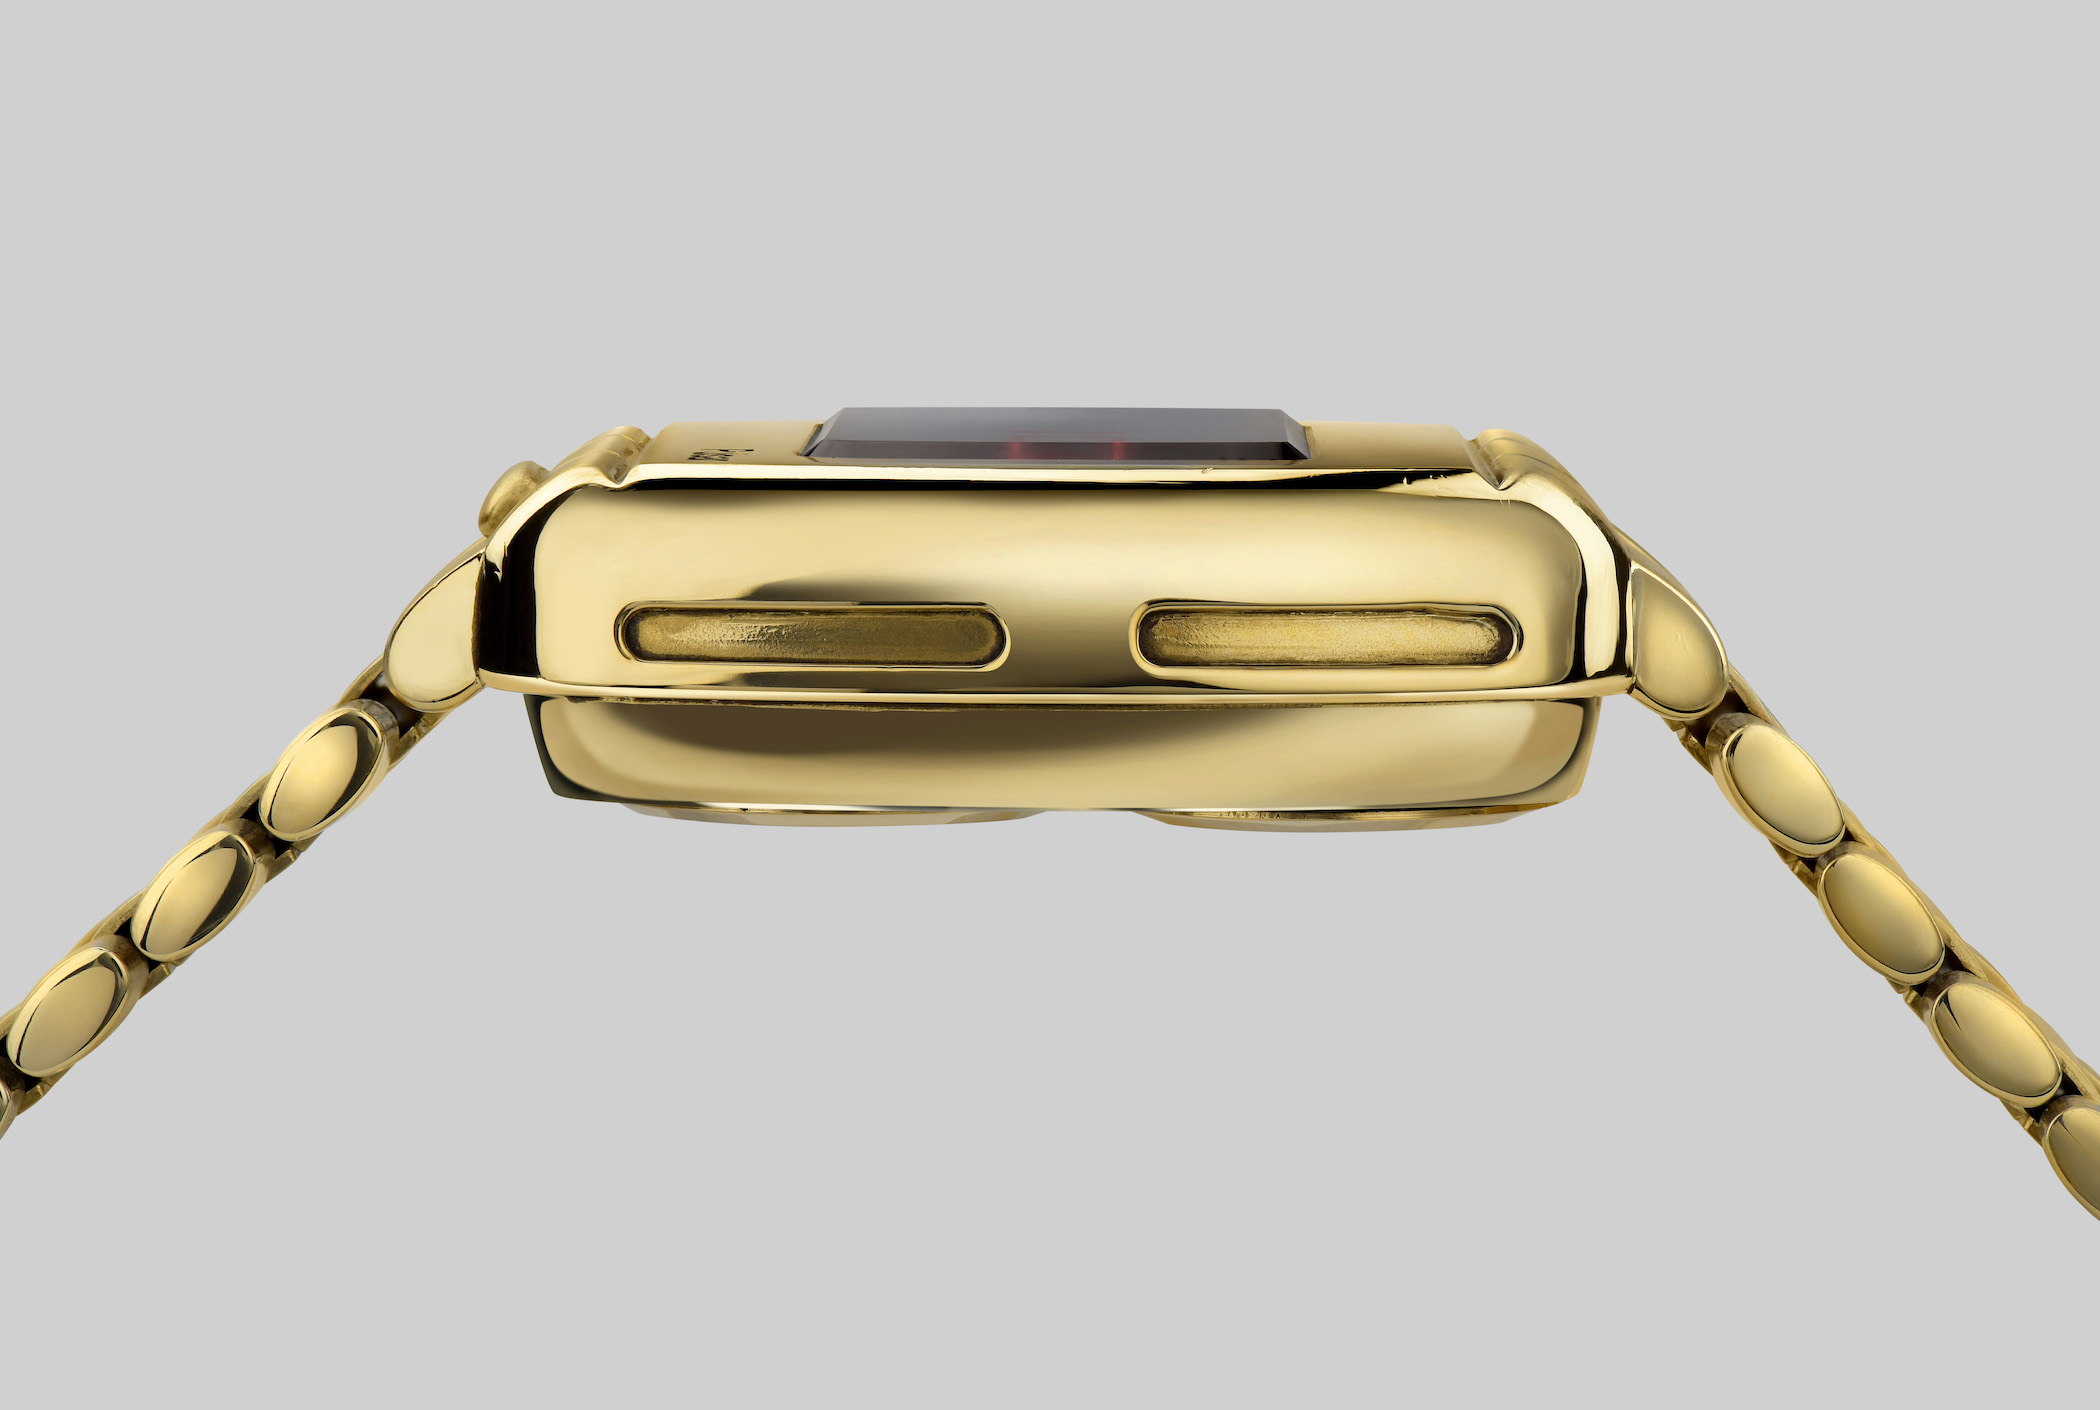 Hamilton Pulsar P1 H00000439 first digital watch 1970 - 4